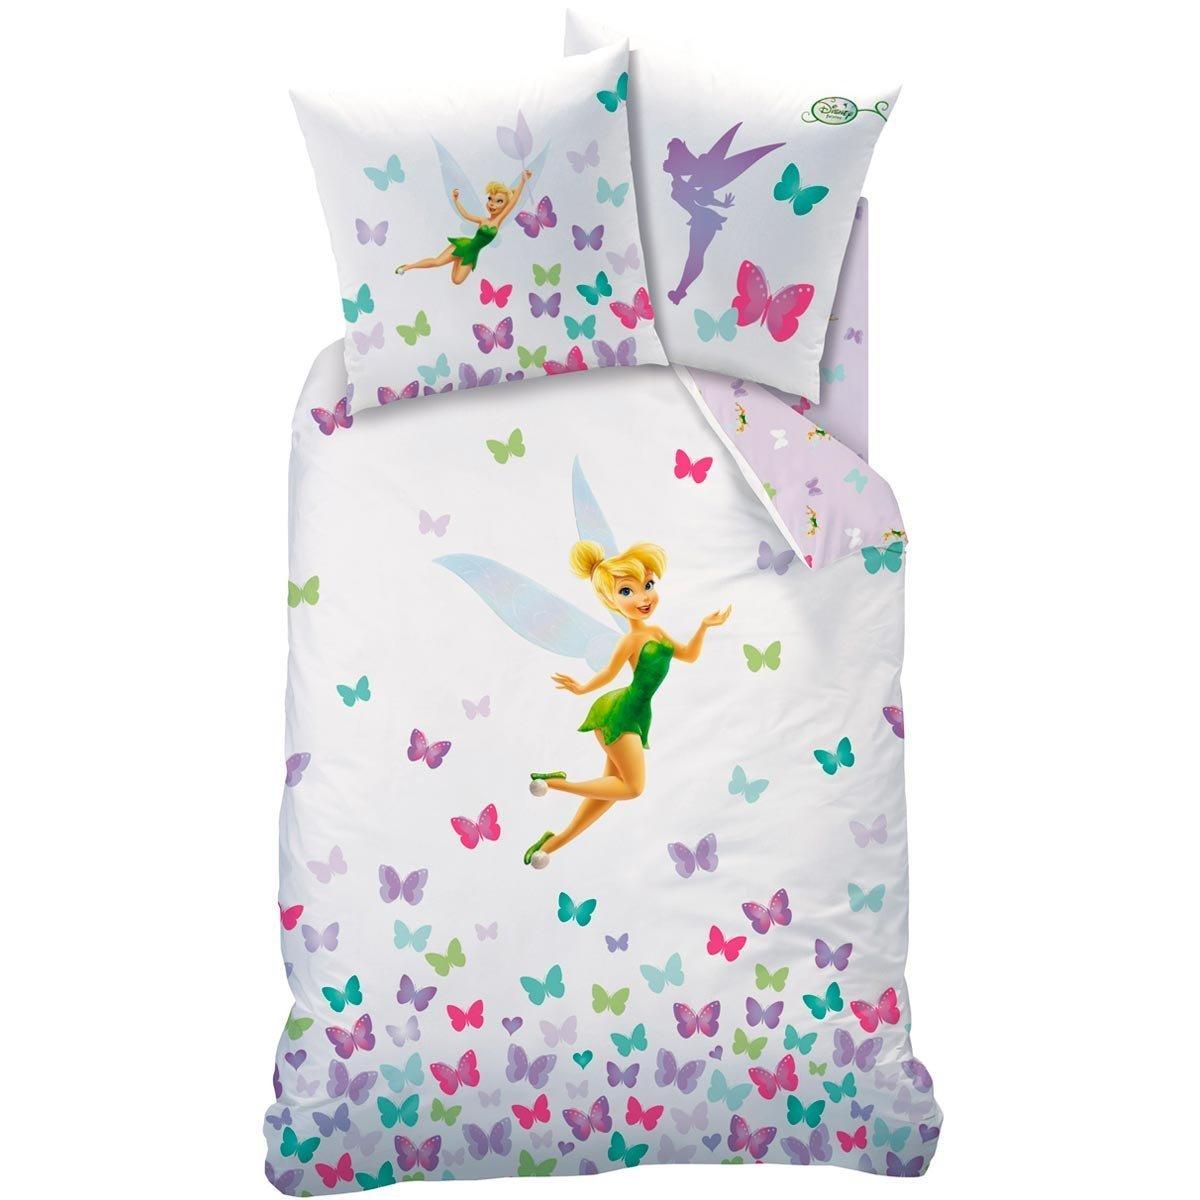 Disney Fairies–Tinker Bell–Bed Linen–100% Cotton Duvet Cover (140x 200cm) + Pillowcase (63 x 63 cm)–Fresh Chaunes Textile Industrie